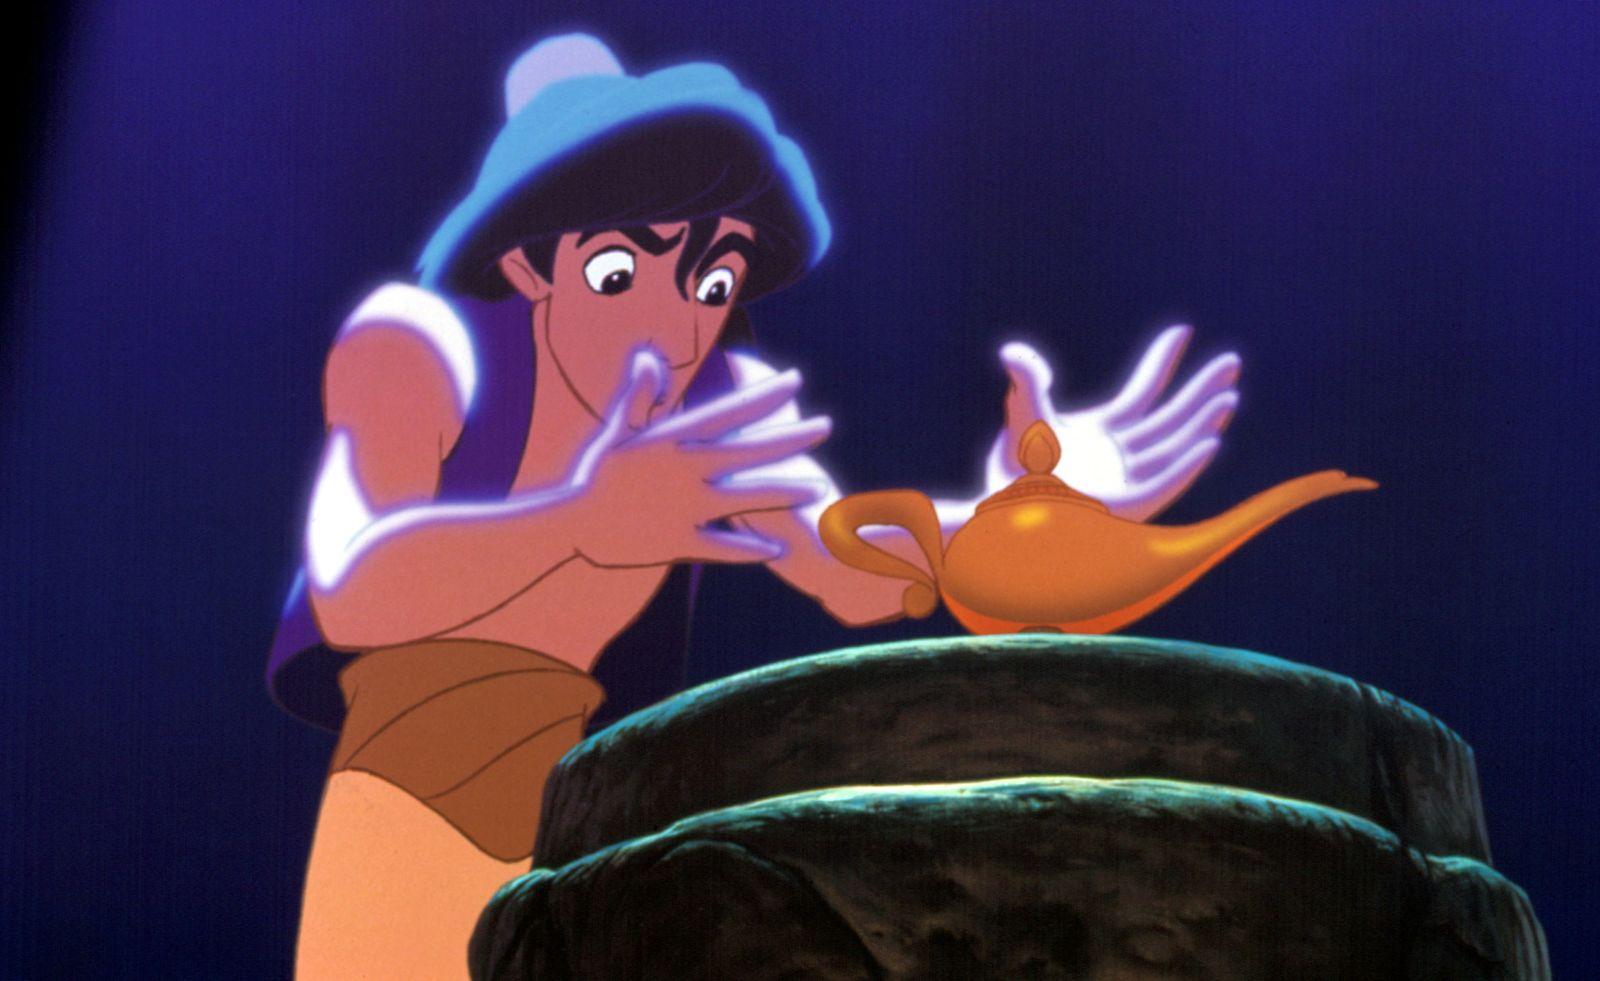 ALADDIN, Aladdin, 1992. (c) Walt Disney/ Courtesy: Everett Collection.